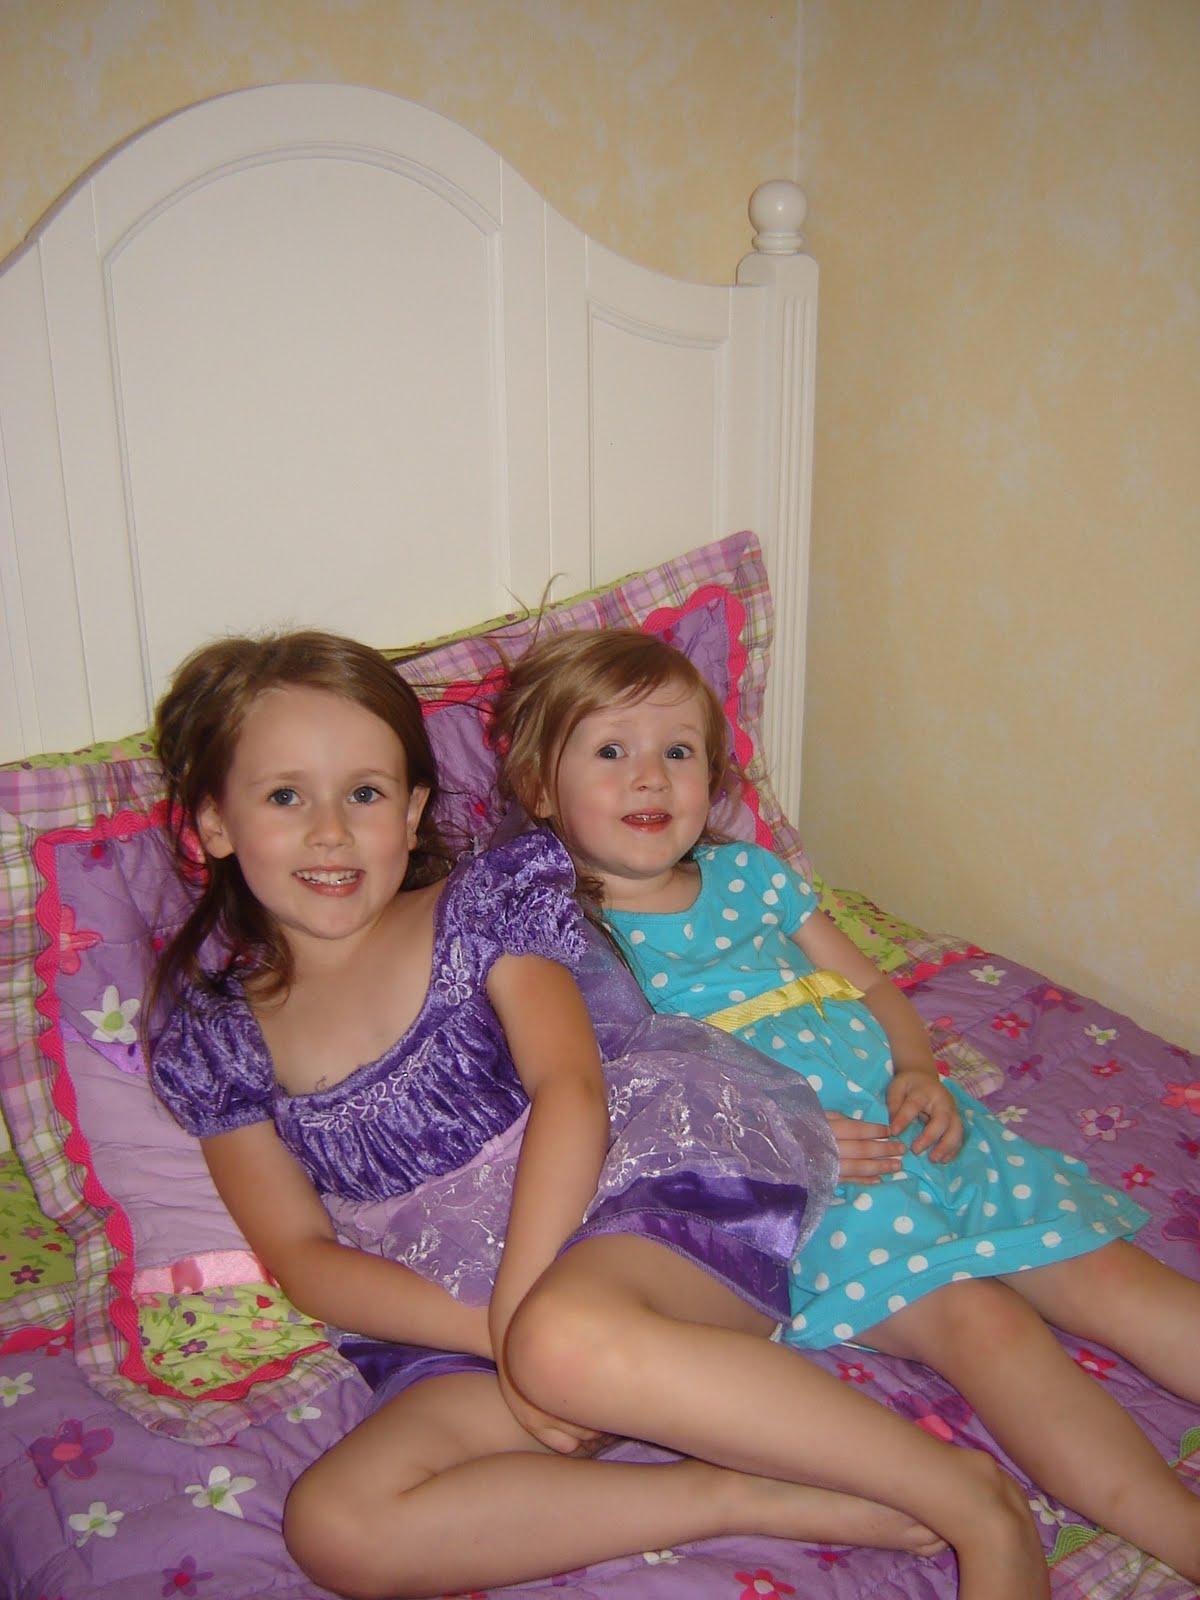 Very Young Little Girls RU